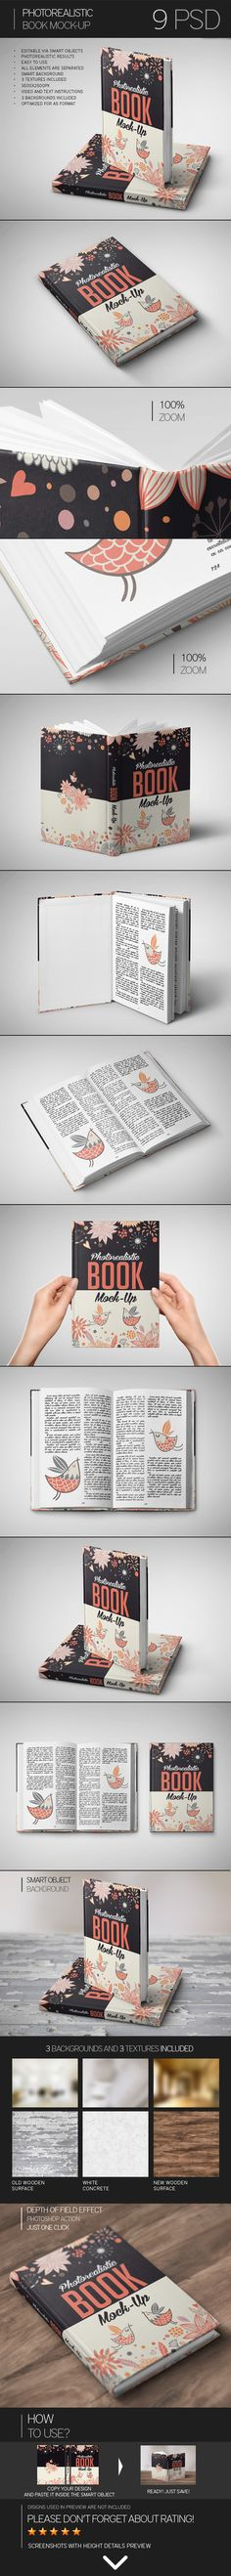 Photorealistic Book Mock-Up on Behance